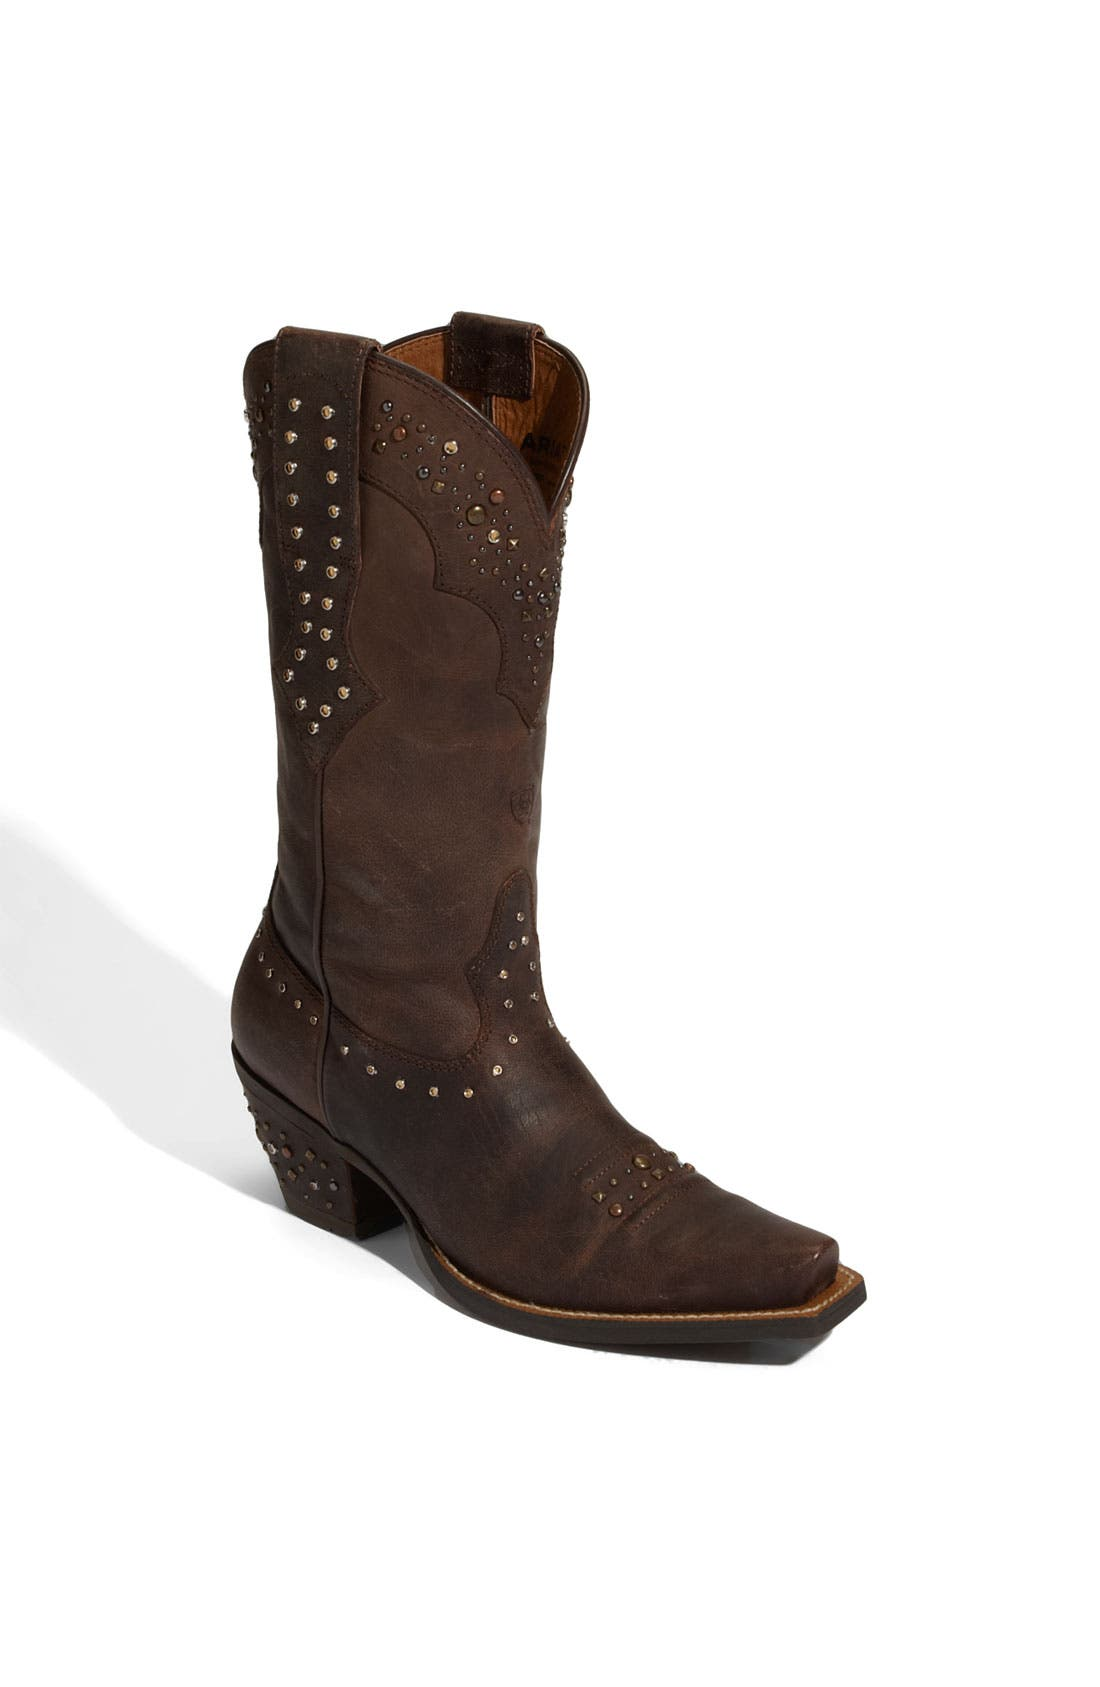 Alternate Image 1 Selected - Ariat 'Rhinestone Cowgirl' Boot